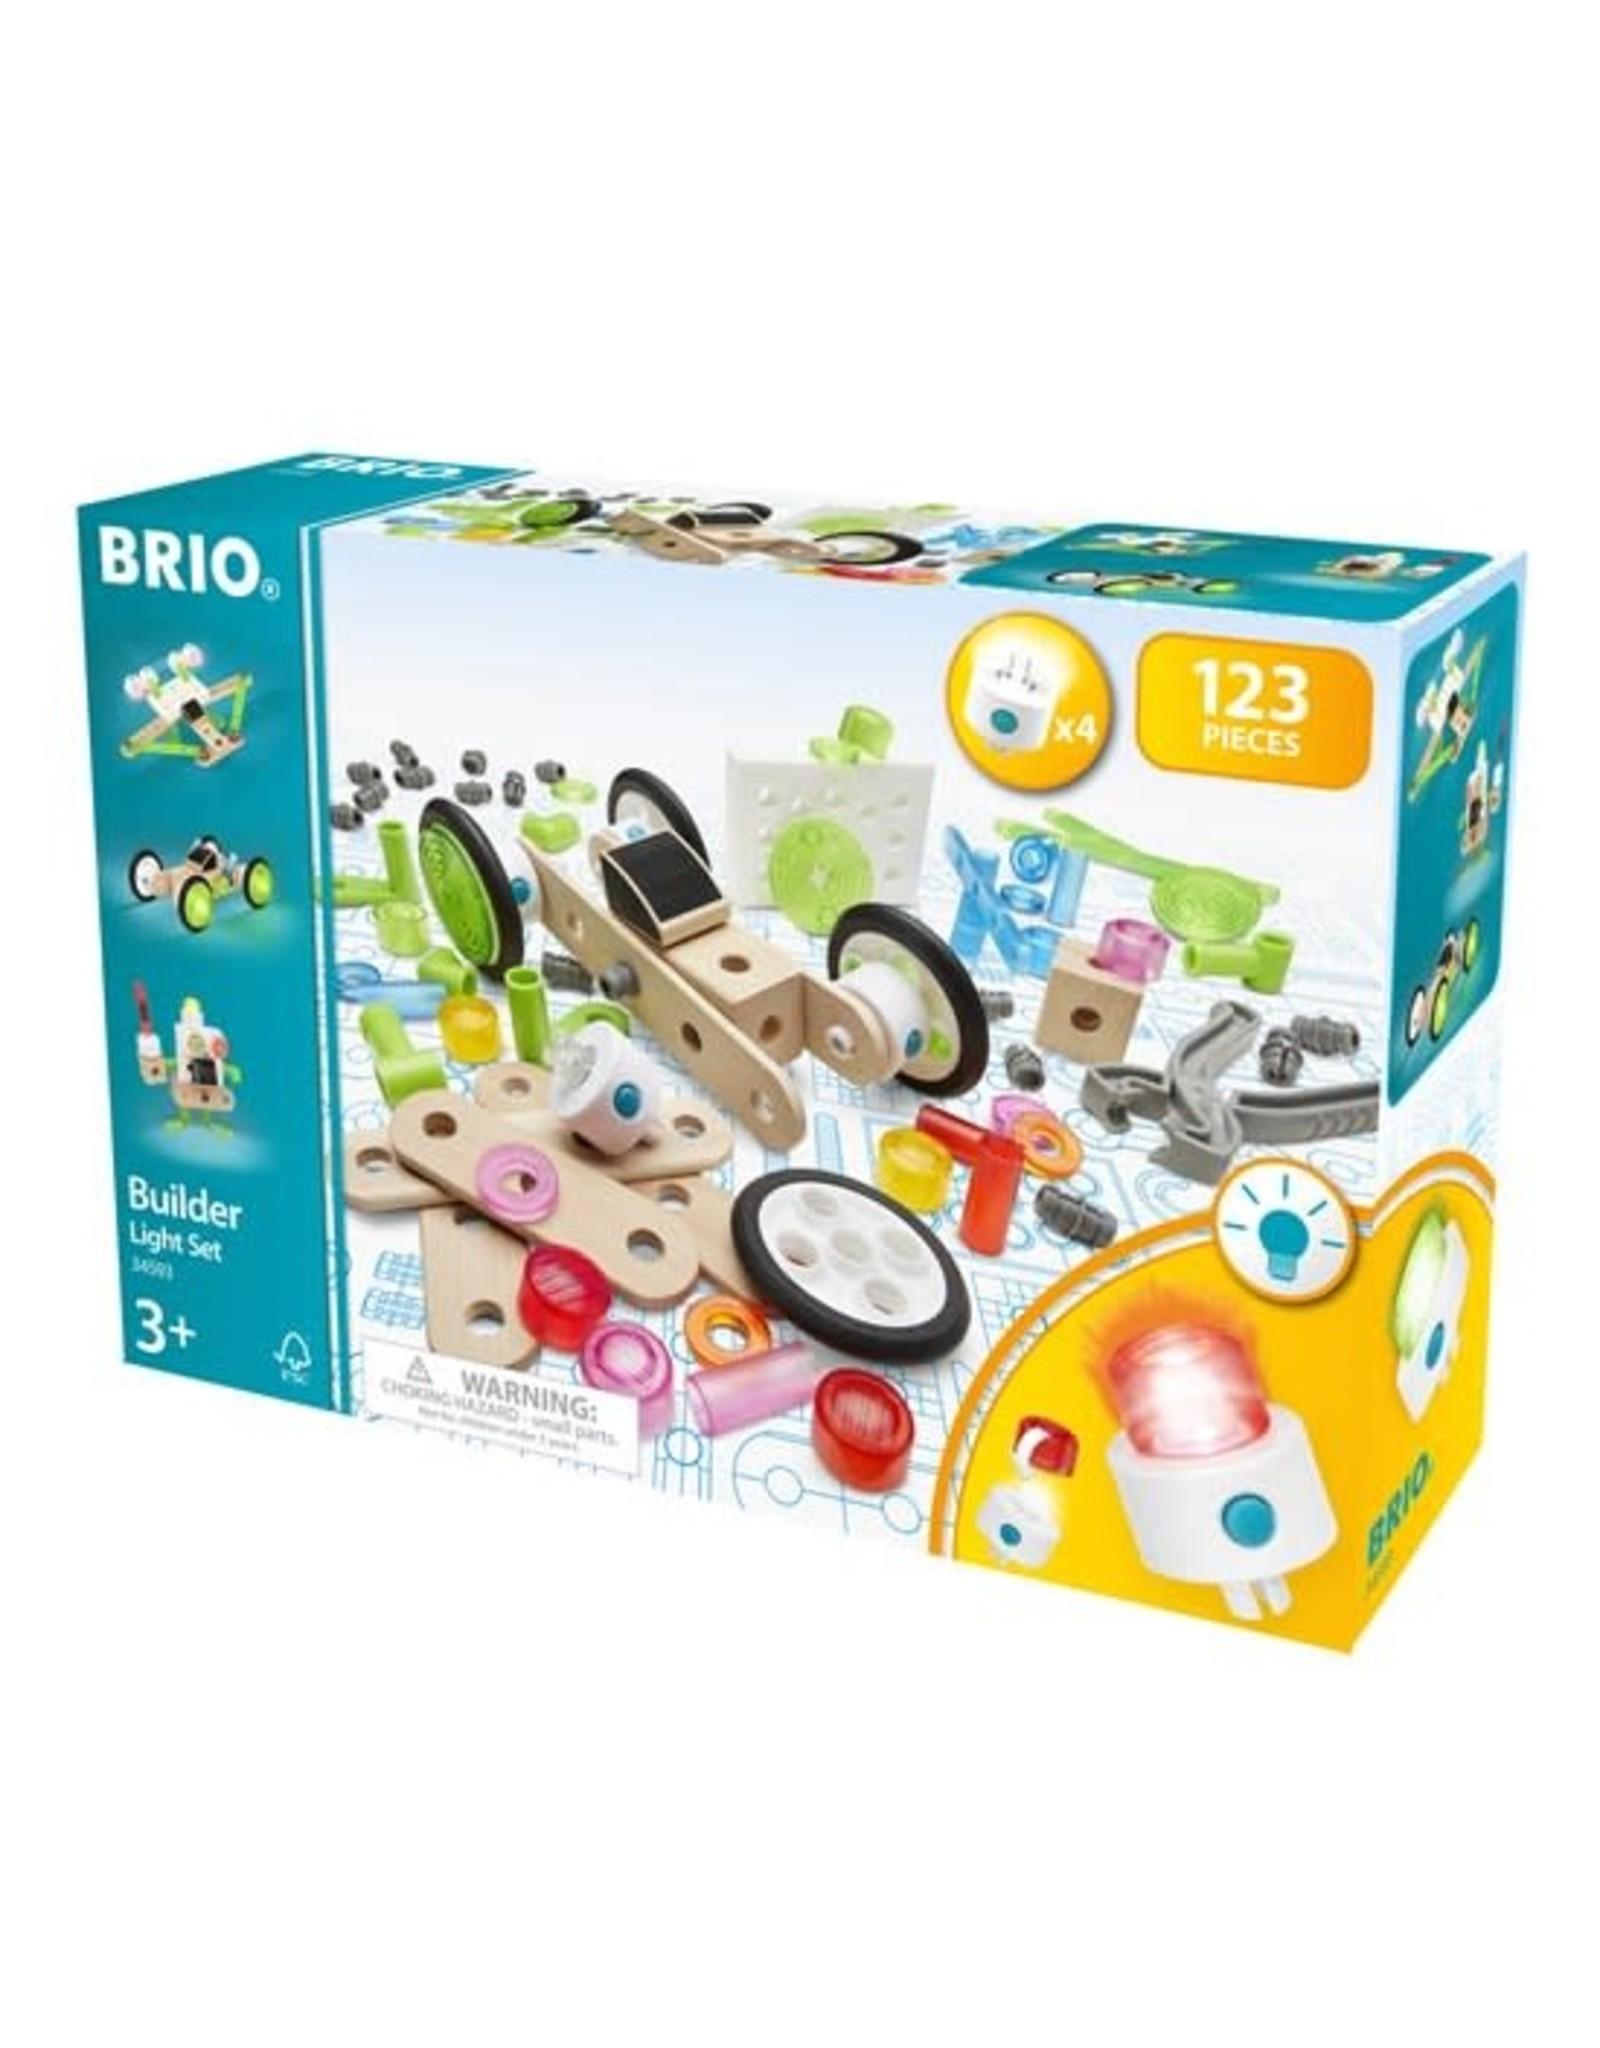 Brio BRIO Builder Light Set